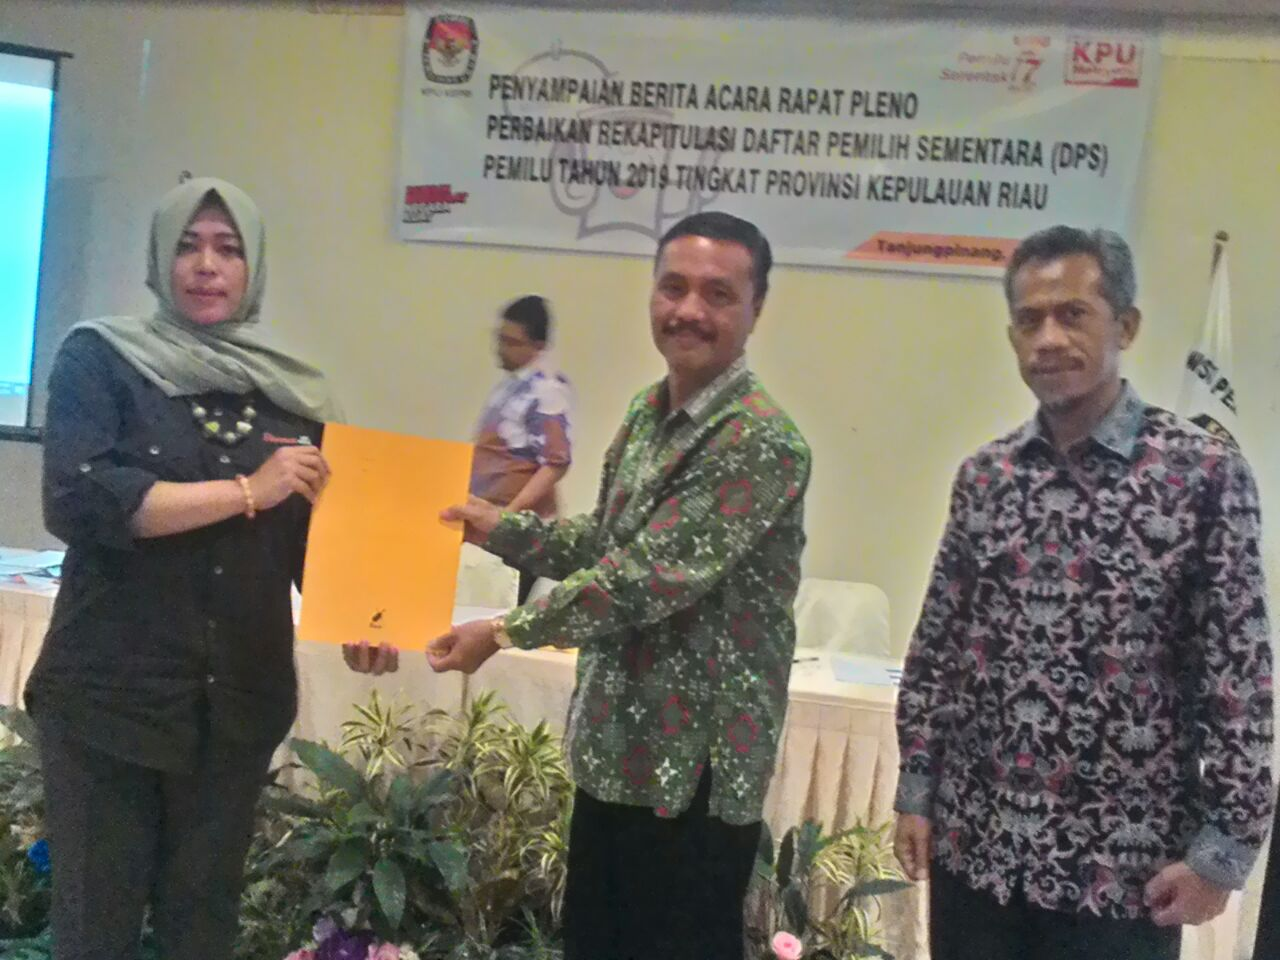 Kepala Bidang Politik Dalam Negeri Badan Kesbangpol Kepri Elman Krisos, menerima berita acara rapat pleno perbaikan Rekapitulasi DPS Pemilu Tahun 2019 dari ketua KPU Kepri Sriwati, di Hotel CK Tanjungpinang, Sabtu (23/6). (Foto : Sugiarto doso)